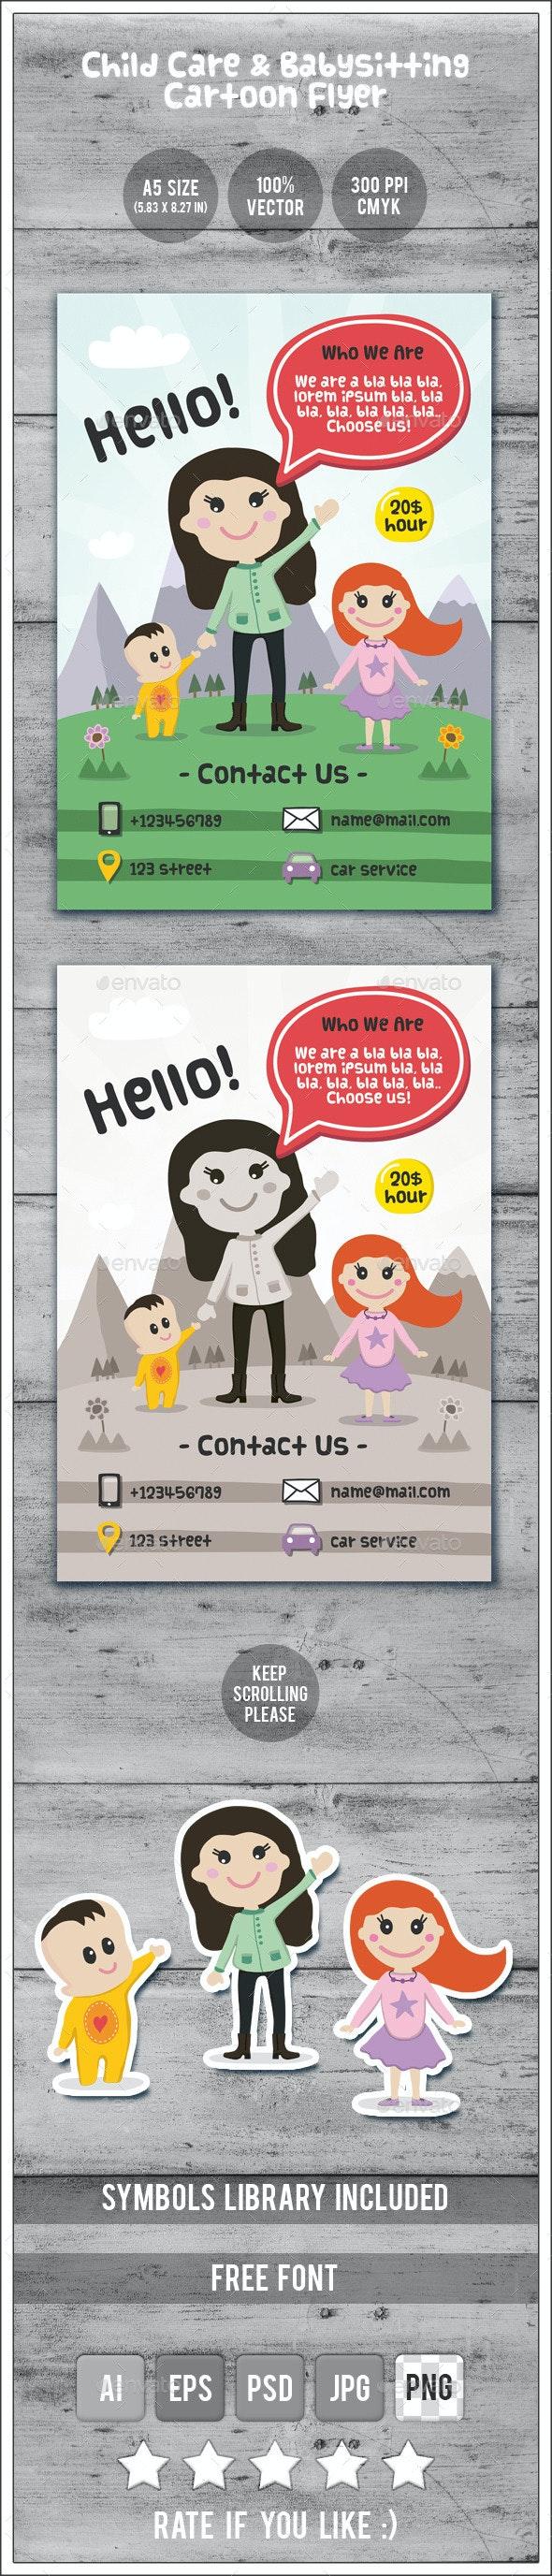 Child Care & Babysitting - Cartoon Flyer - Commerce Flyers